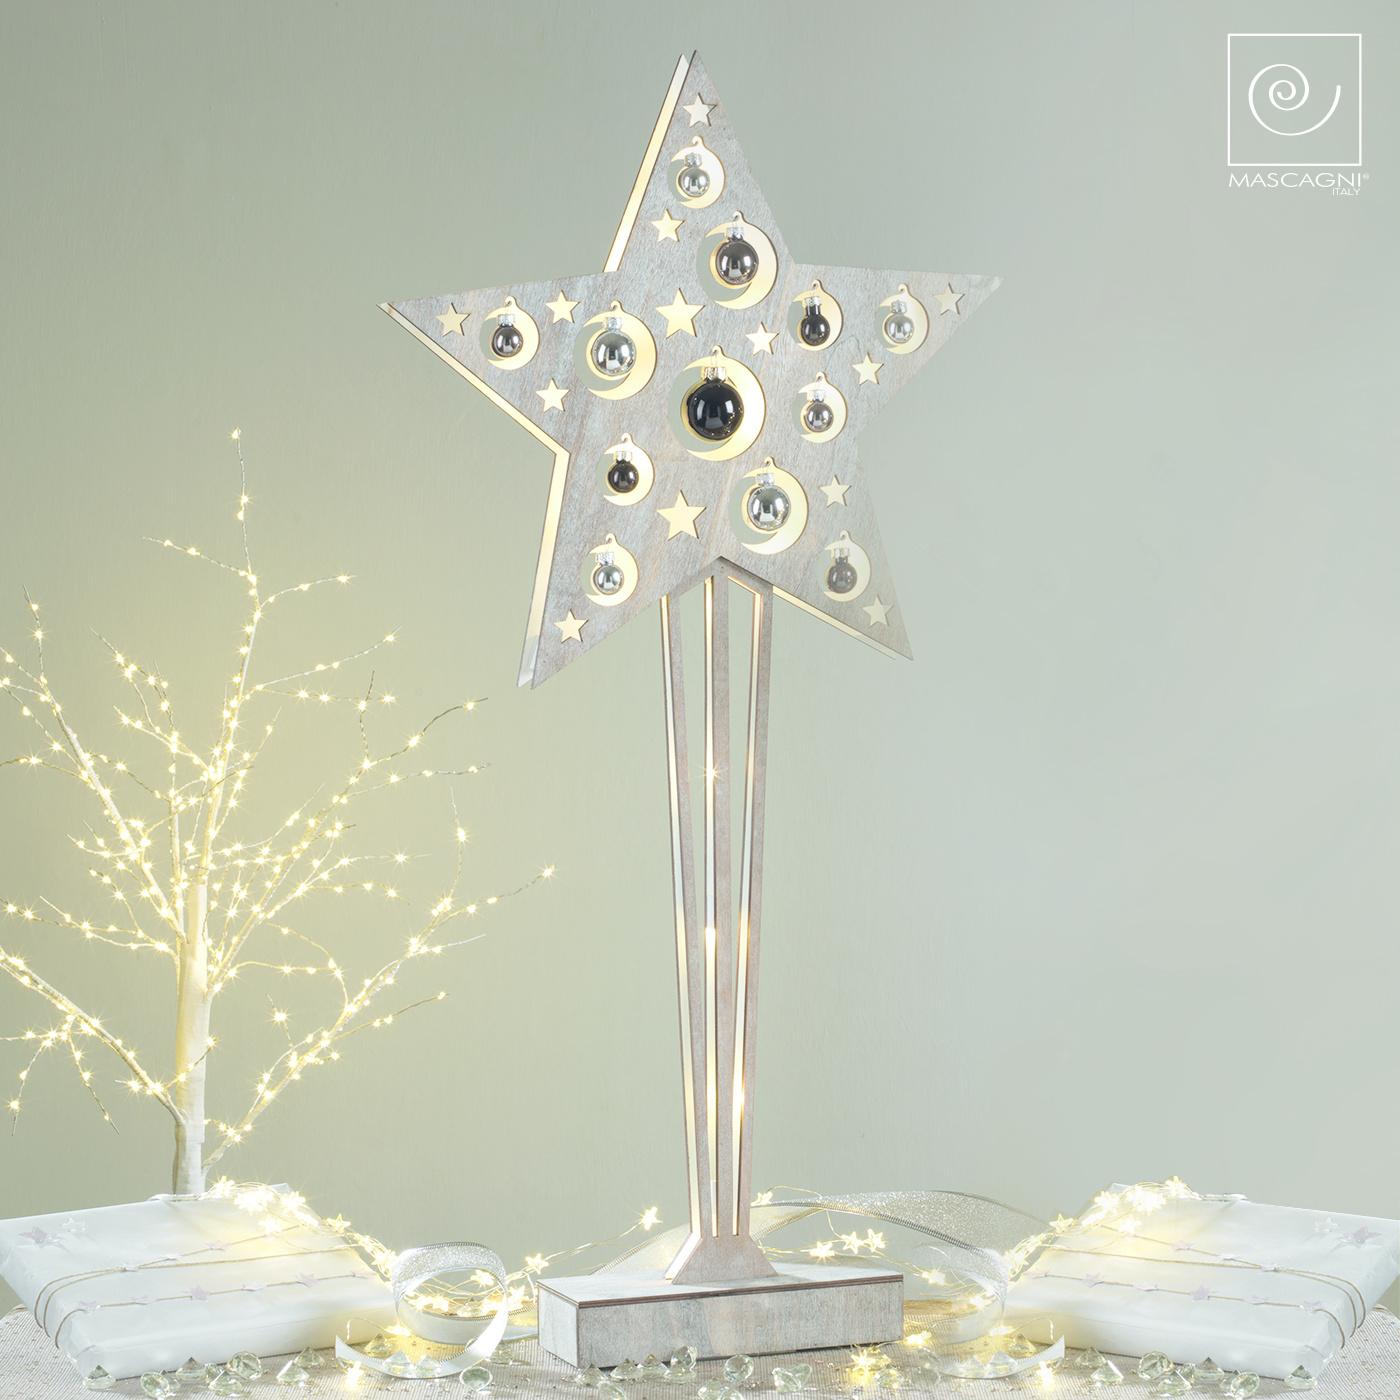 Art Mascagni LED STAR CM.75 - COL. WHITE